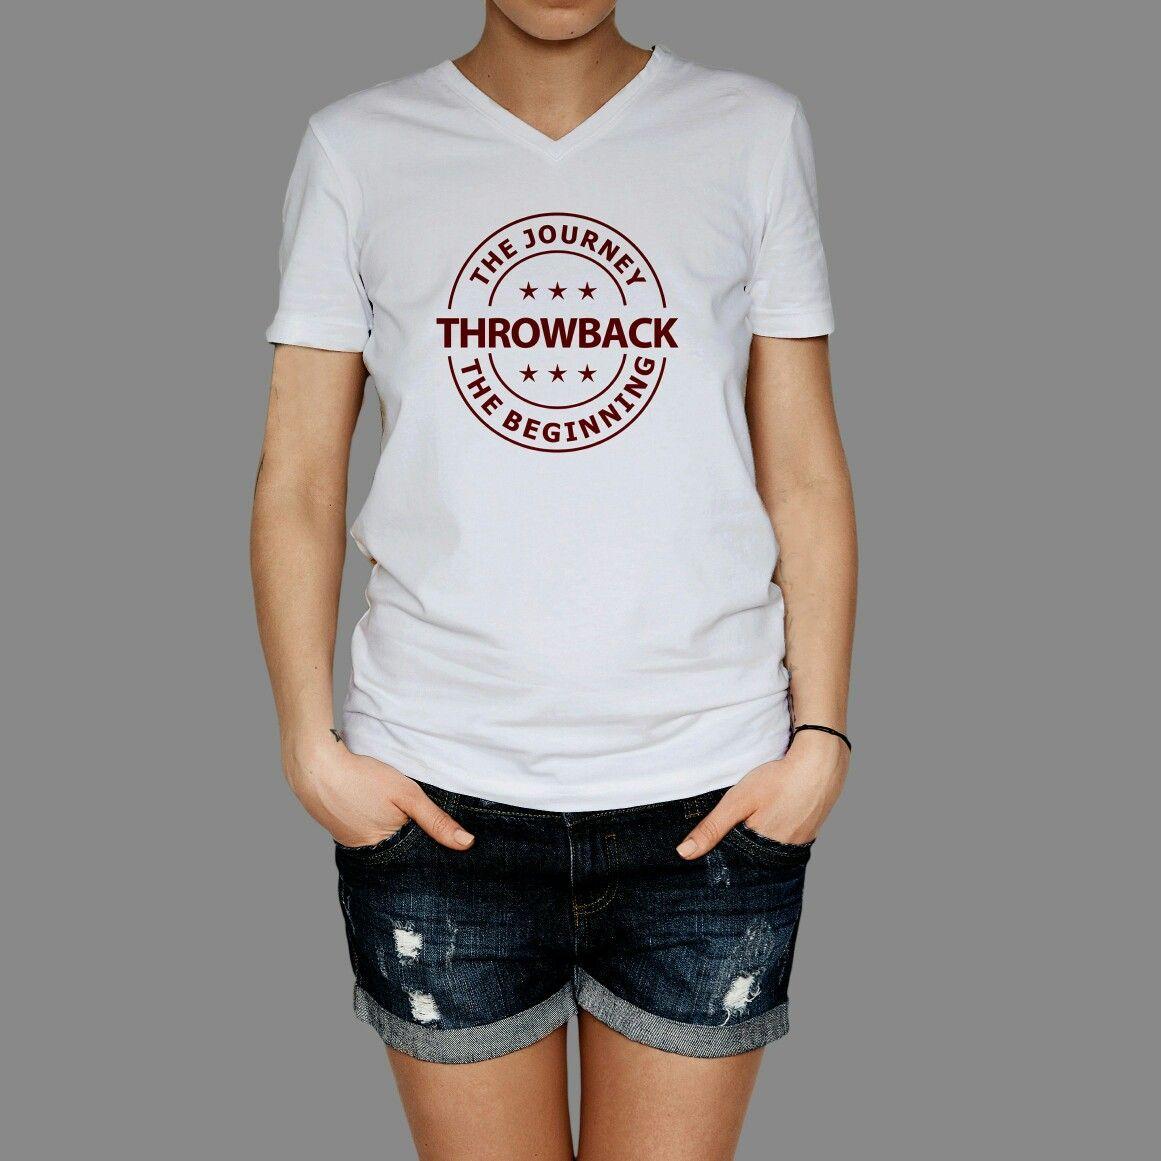 Throwback Women T-shirt